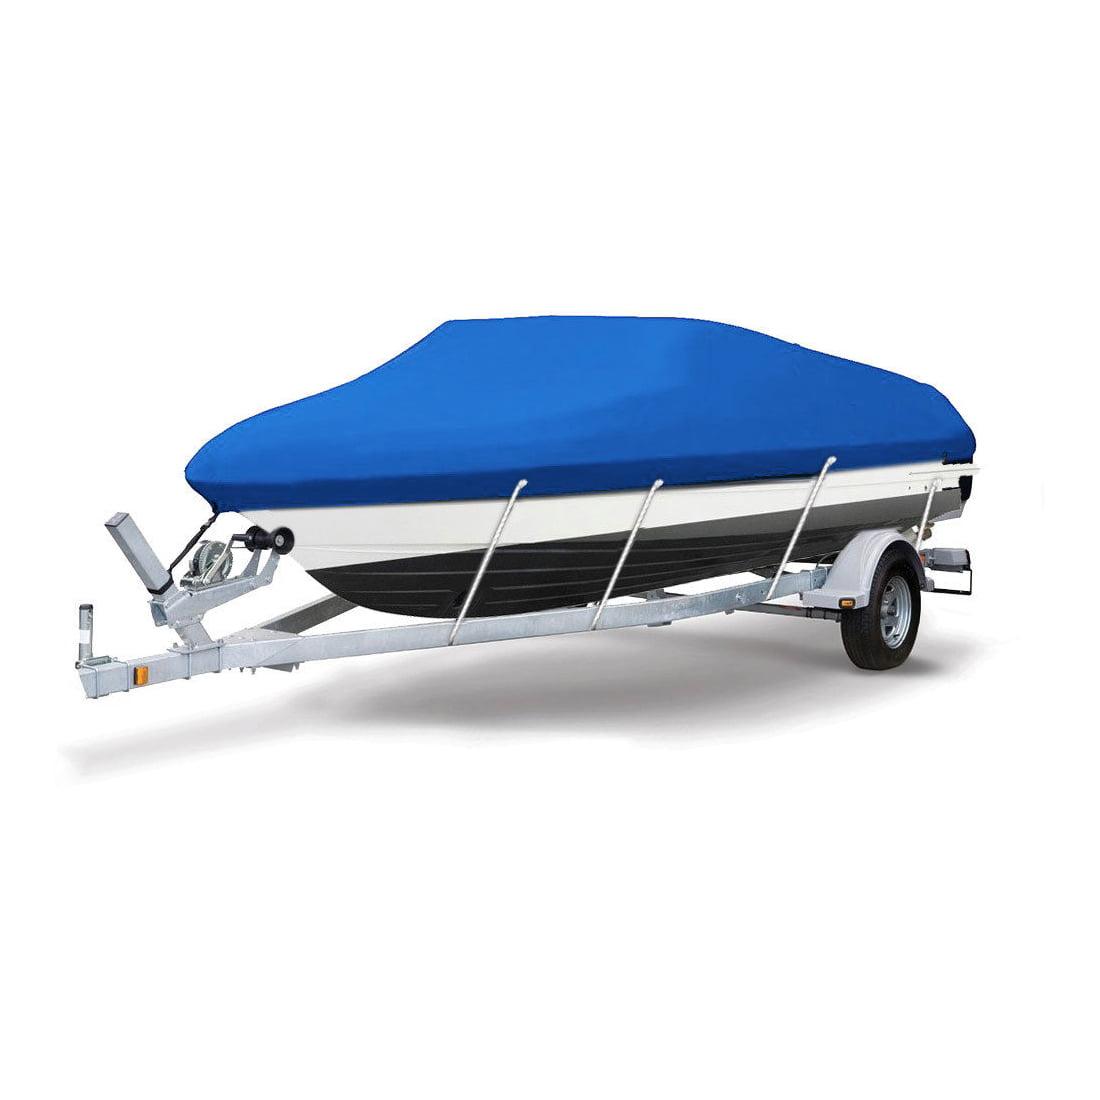 "Blue 210D Waterproof Trailerable Boat Cover Fit 14-16ft Beam 90"" V-Hull Fishing SKI Boat"